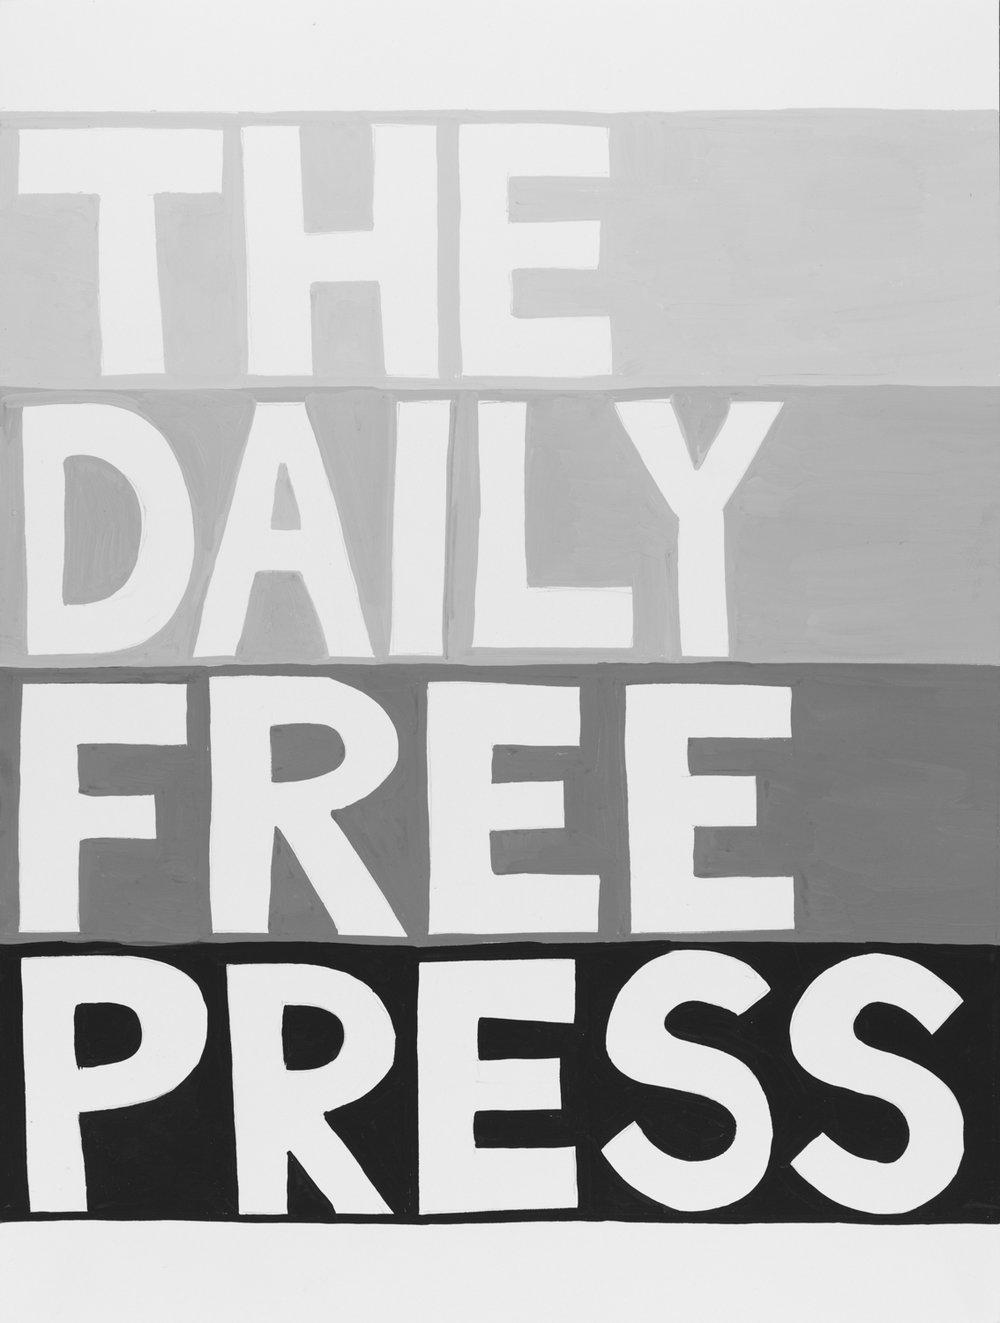 thedailyfreepress.jpg